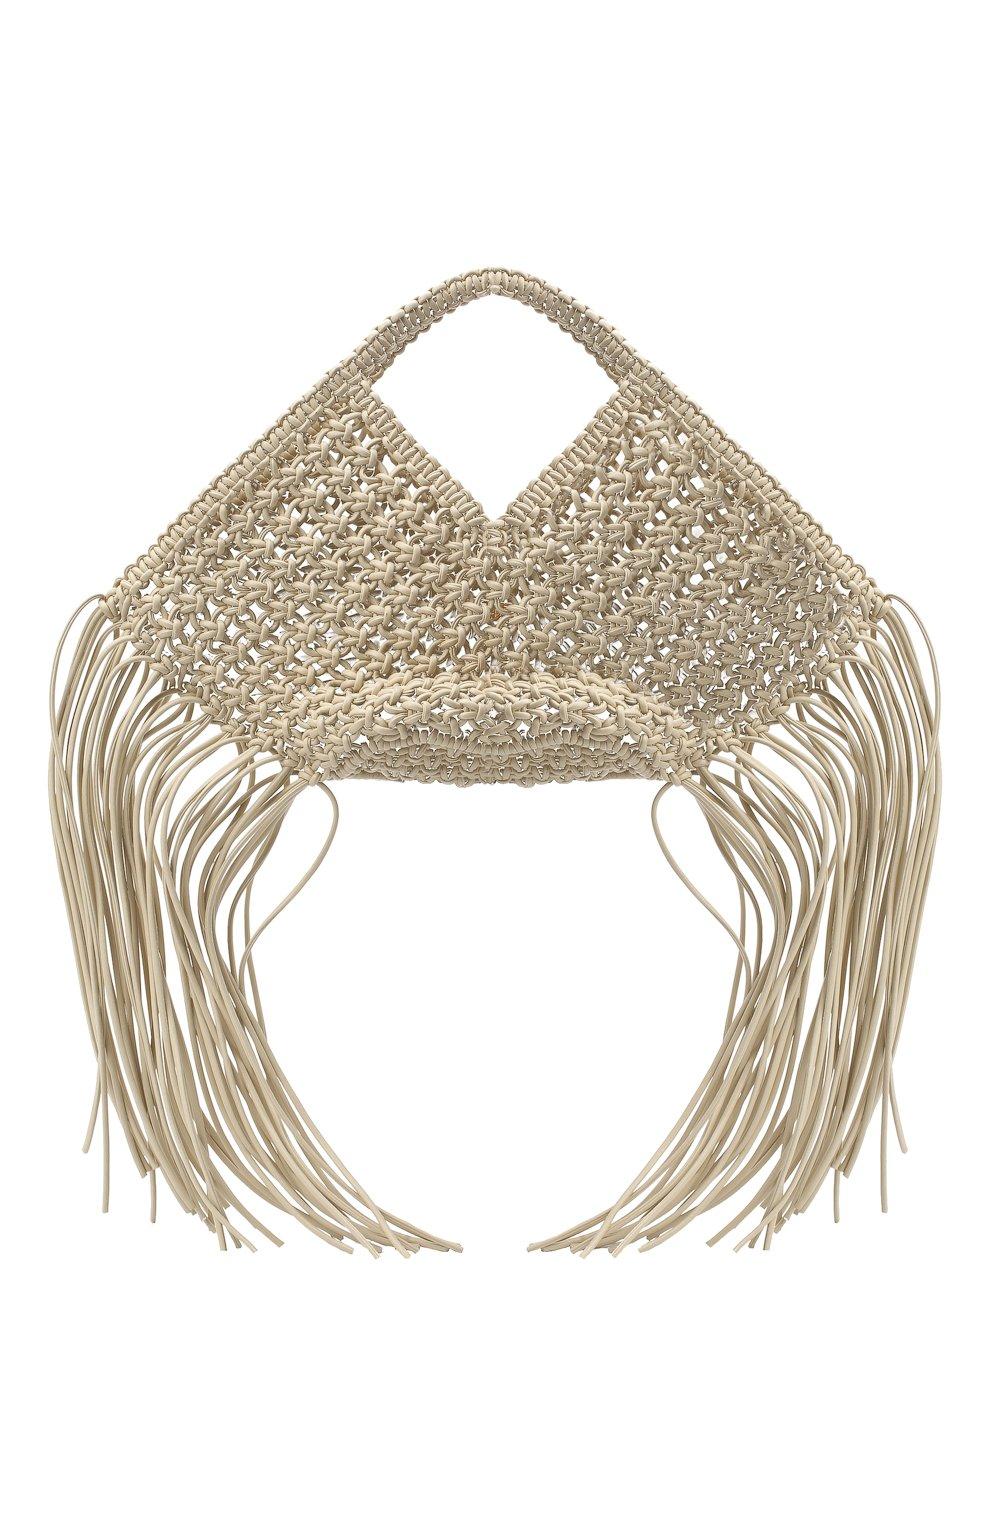 Женский сумка basket YUZEFI светло-бежевого цвета, арт. YUZPF20-SW-01 | Фото 1 (Сумки-технические: Сумки-шопперы; Ошибки технического описания: Нет ширины; Размер: medium; Материал: Текстиль)